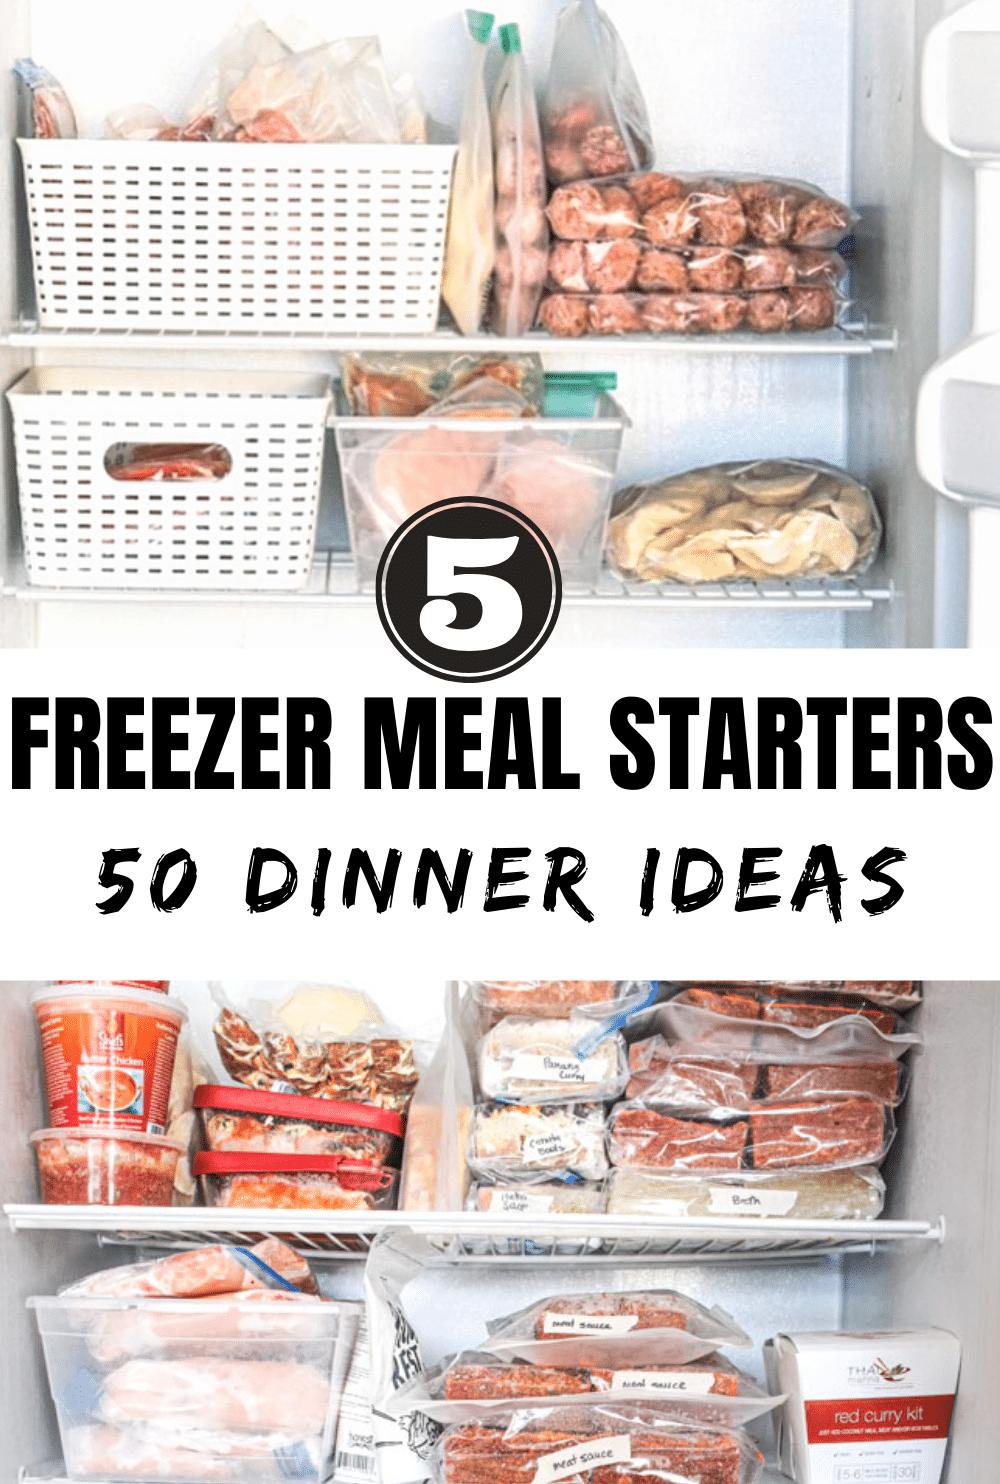 5 freezer meal starters 50 dinner ideas